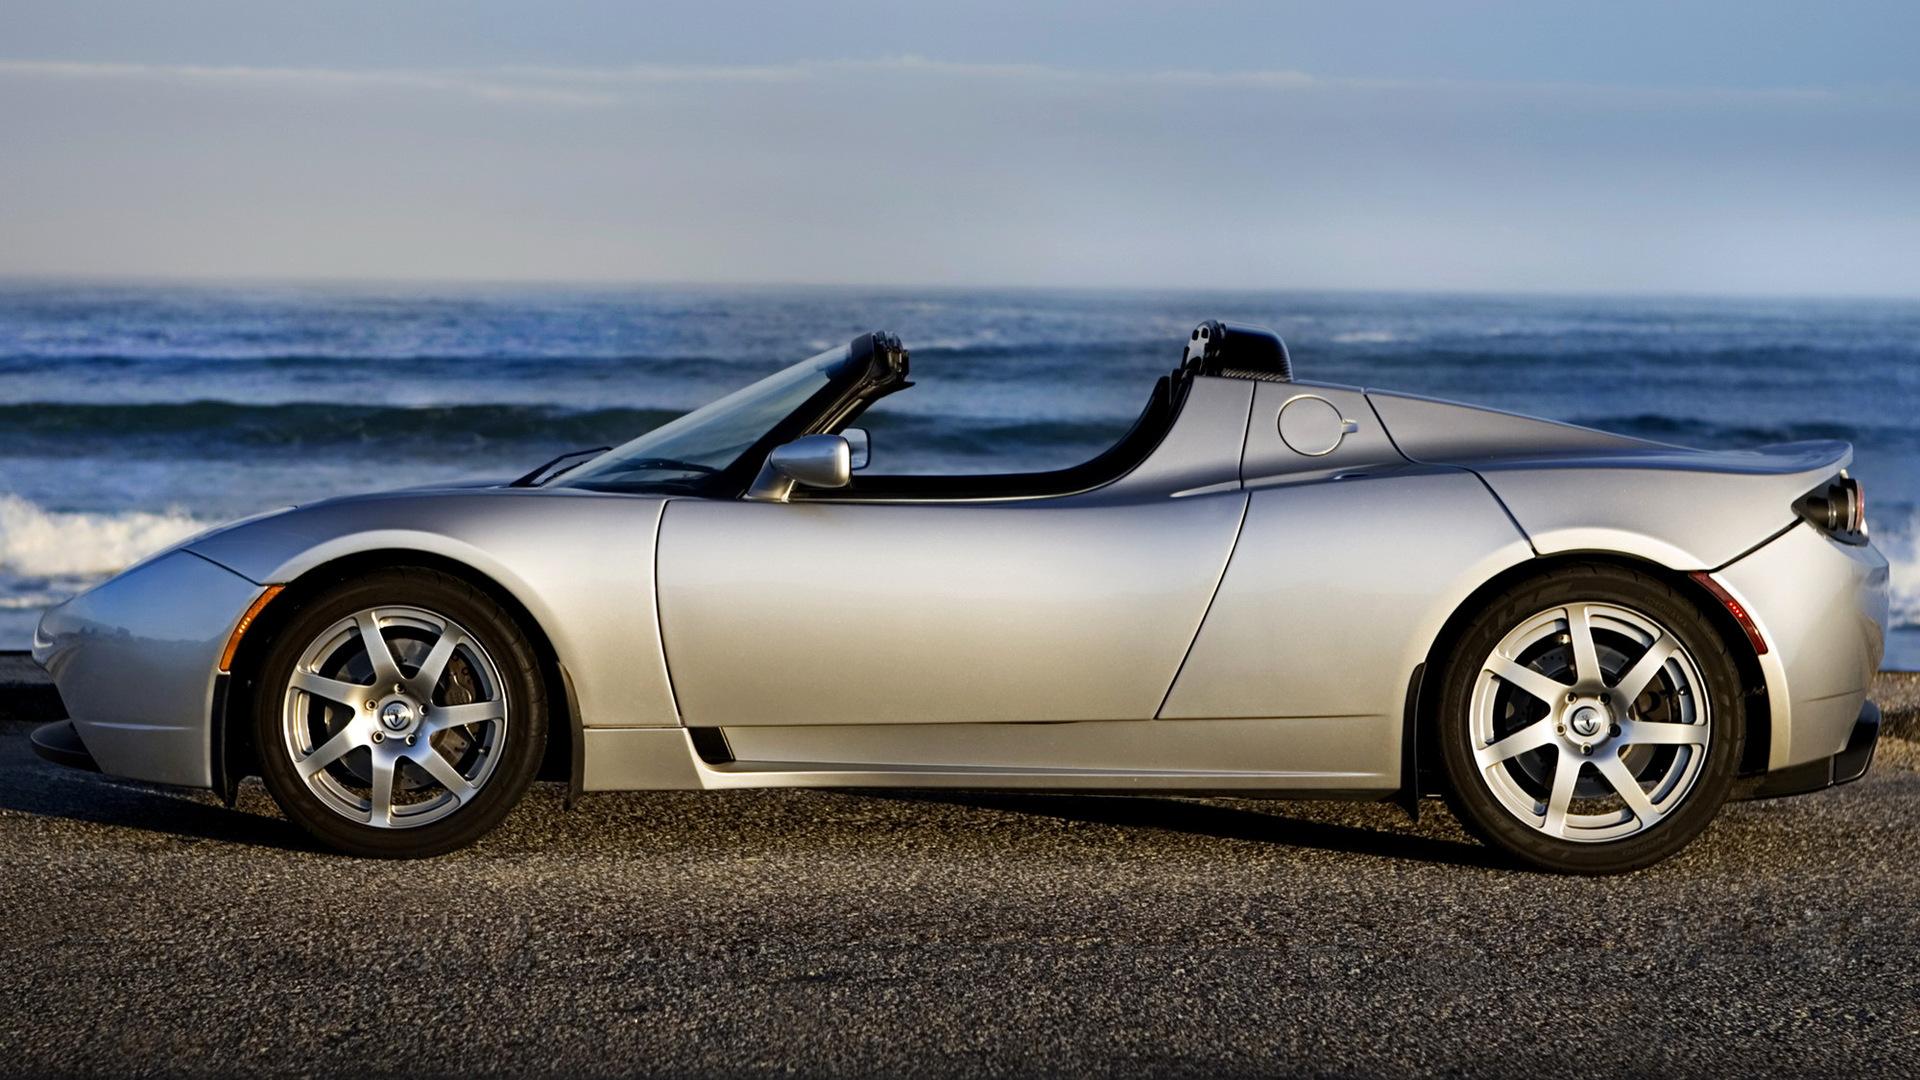 Car Electric Car Silver Car Small Sized Car Sport Car Tesla Roadster Wallpaper Resolution 1920x1080 Id 1044515 Wallha Com